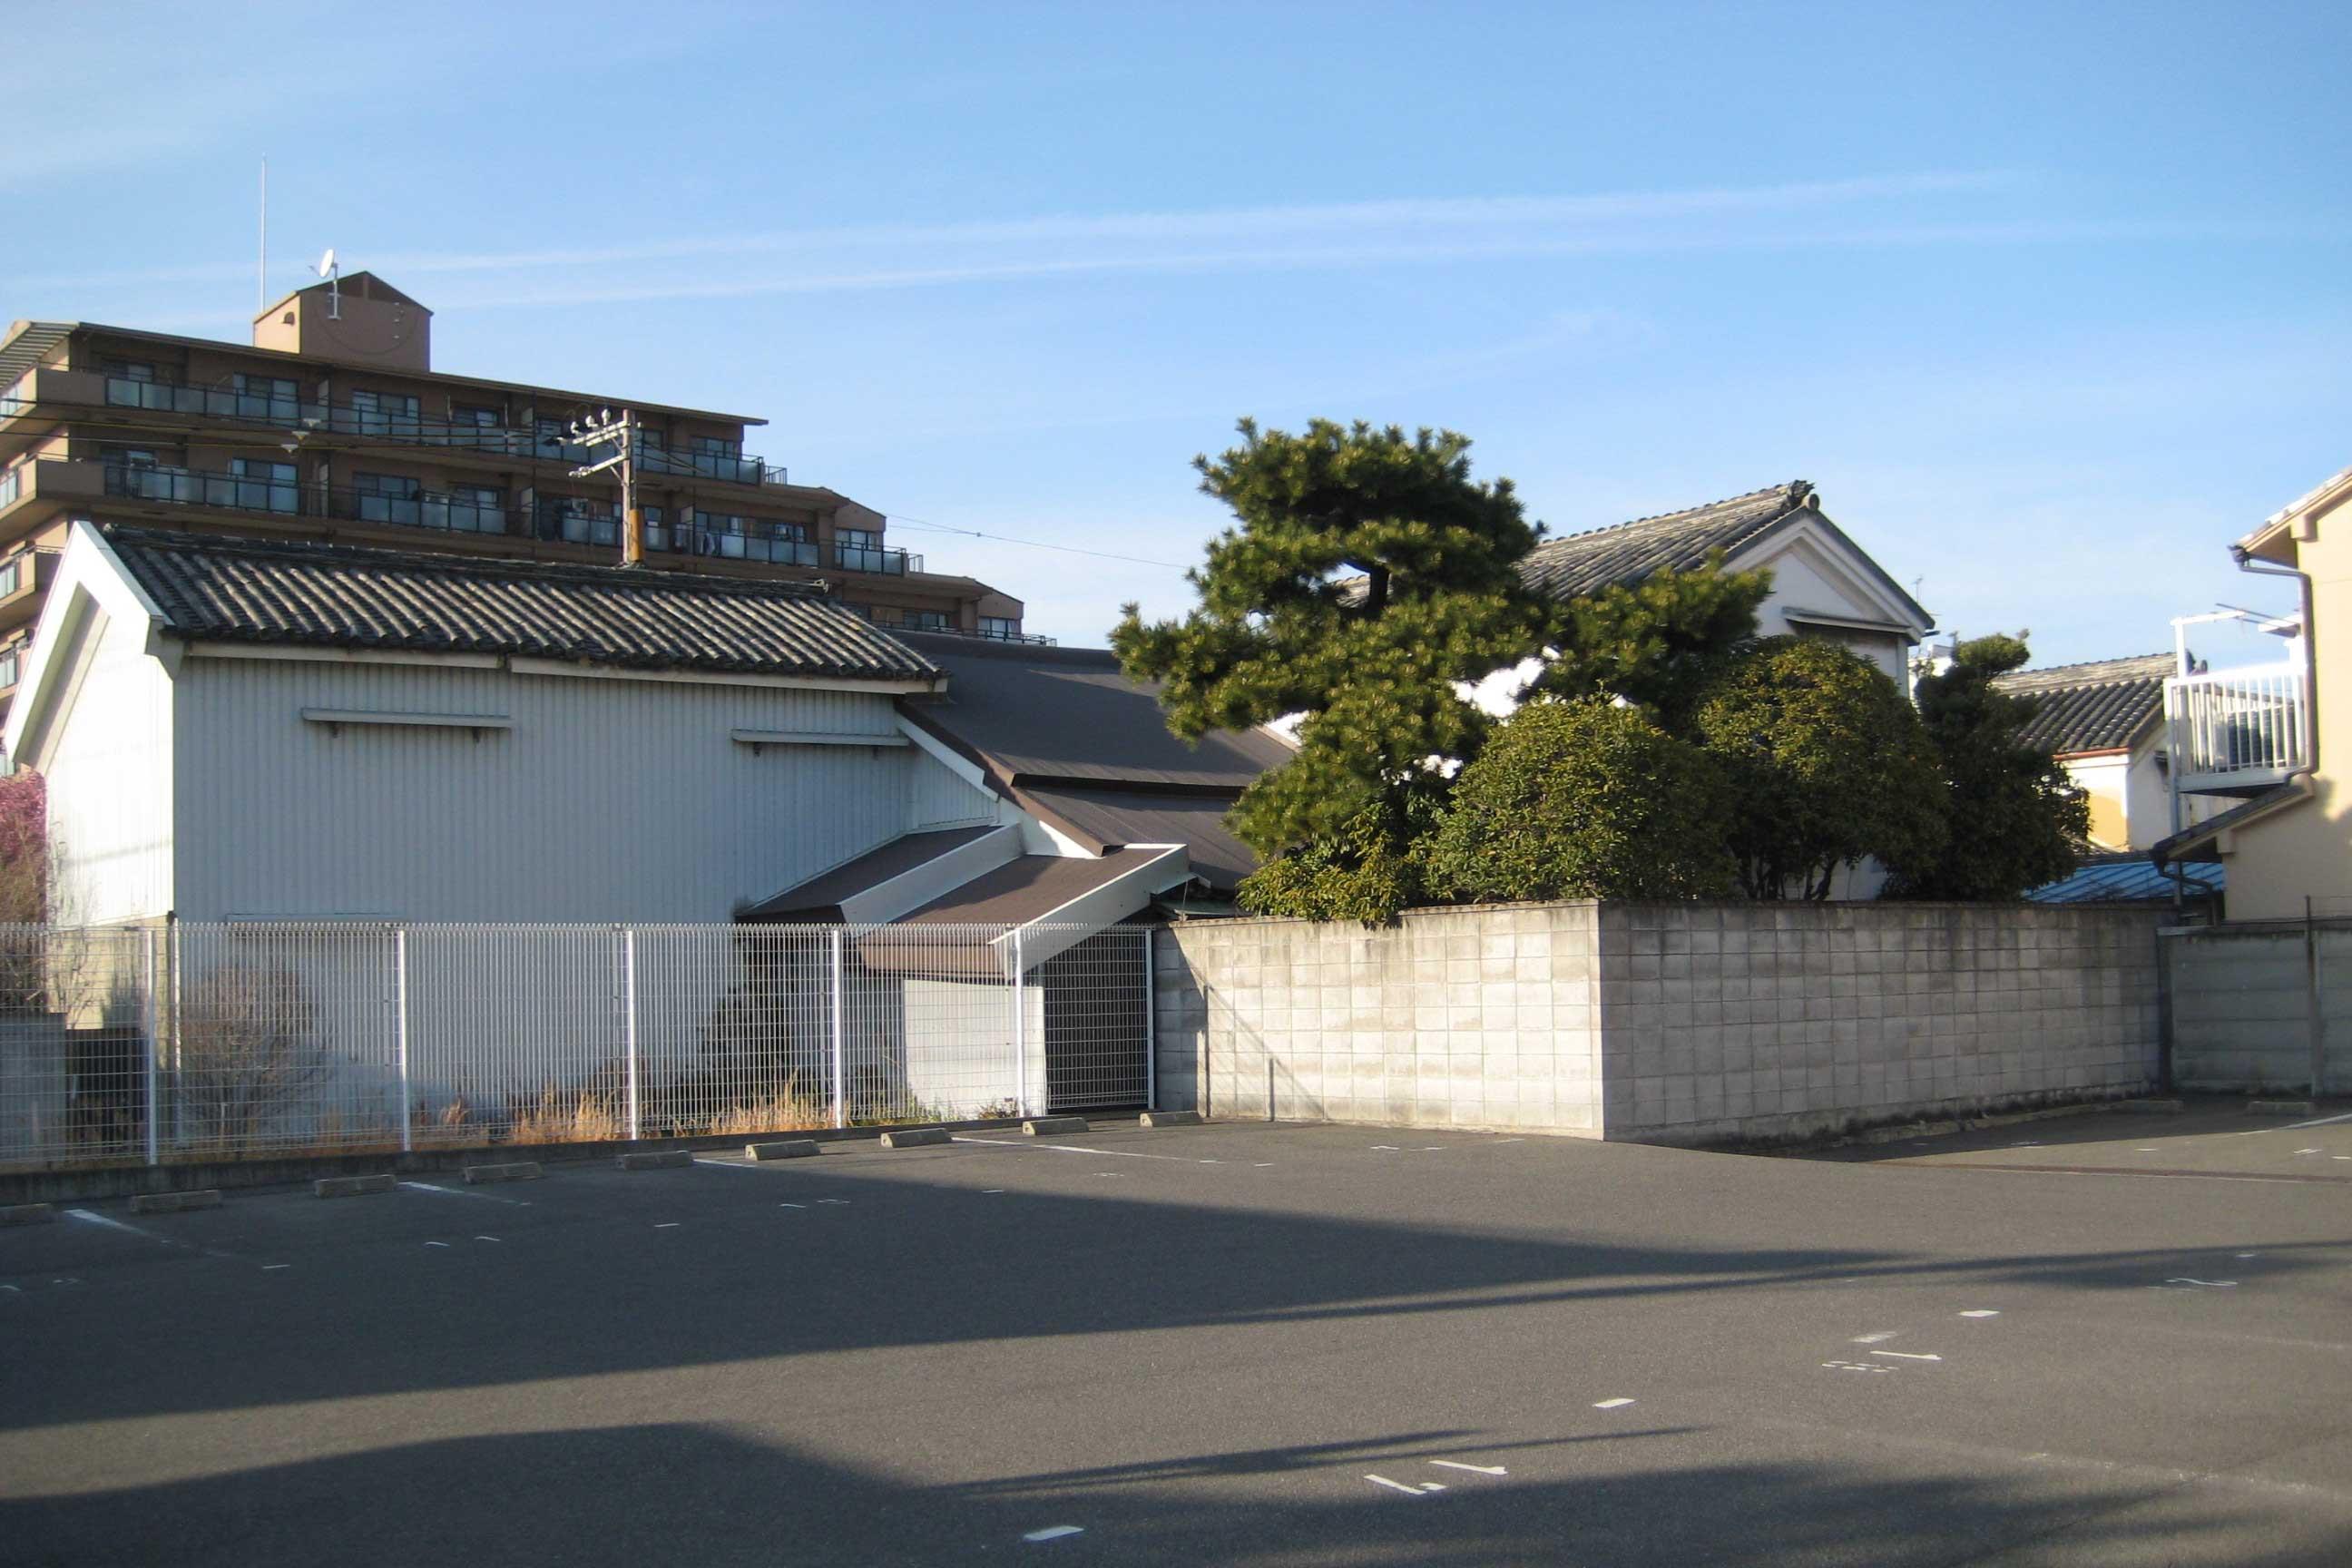 <p>府道堺阪南線側から望見</p>左手平面外観が衣装蔵、右手妻面外観が道具蔵